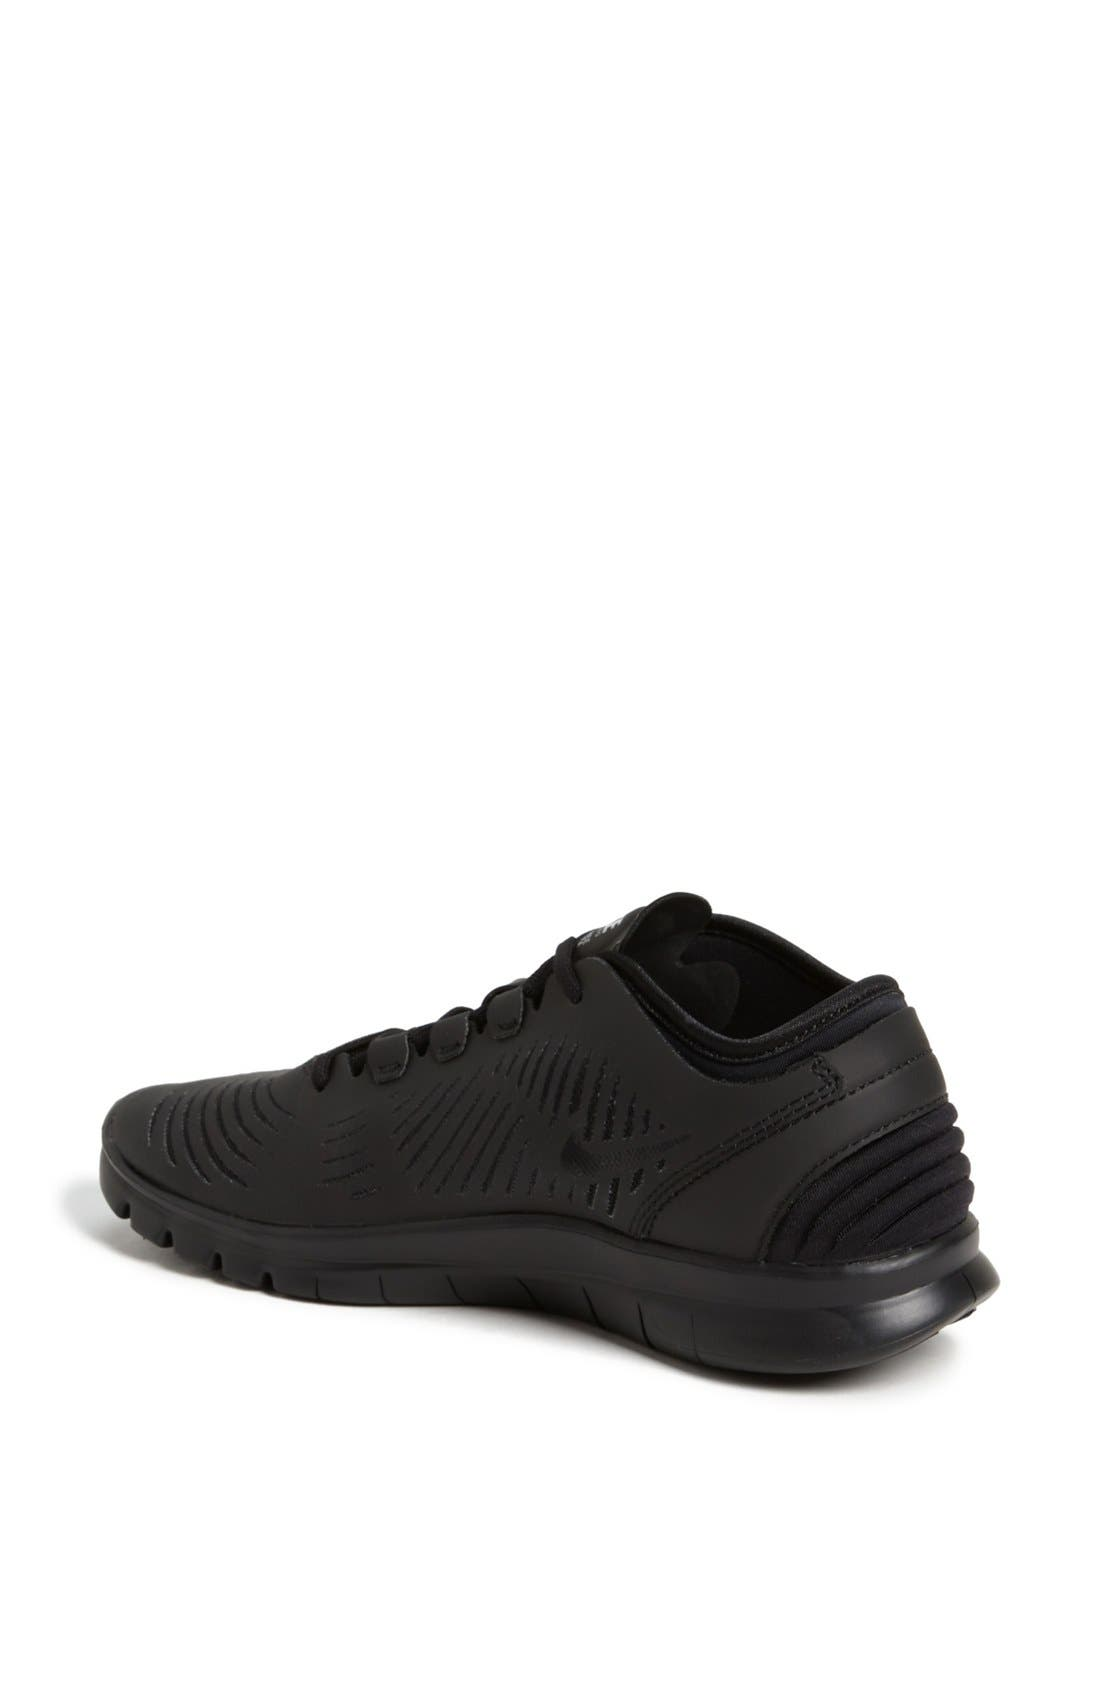 41b66e01770f8 ... get official nike free balanza training shoe women nordstrom 265fc  0ac6e 782de 86e74